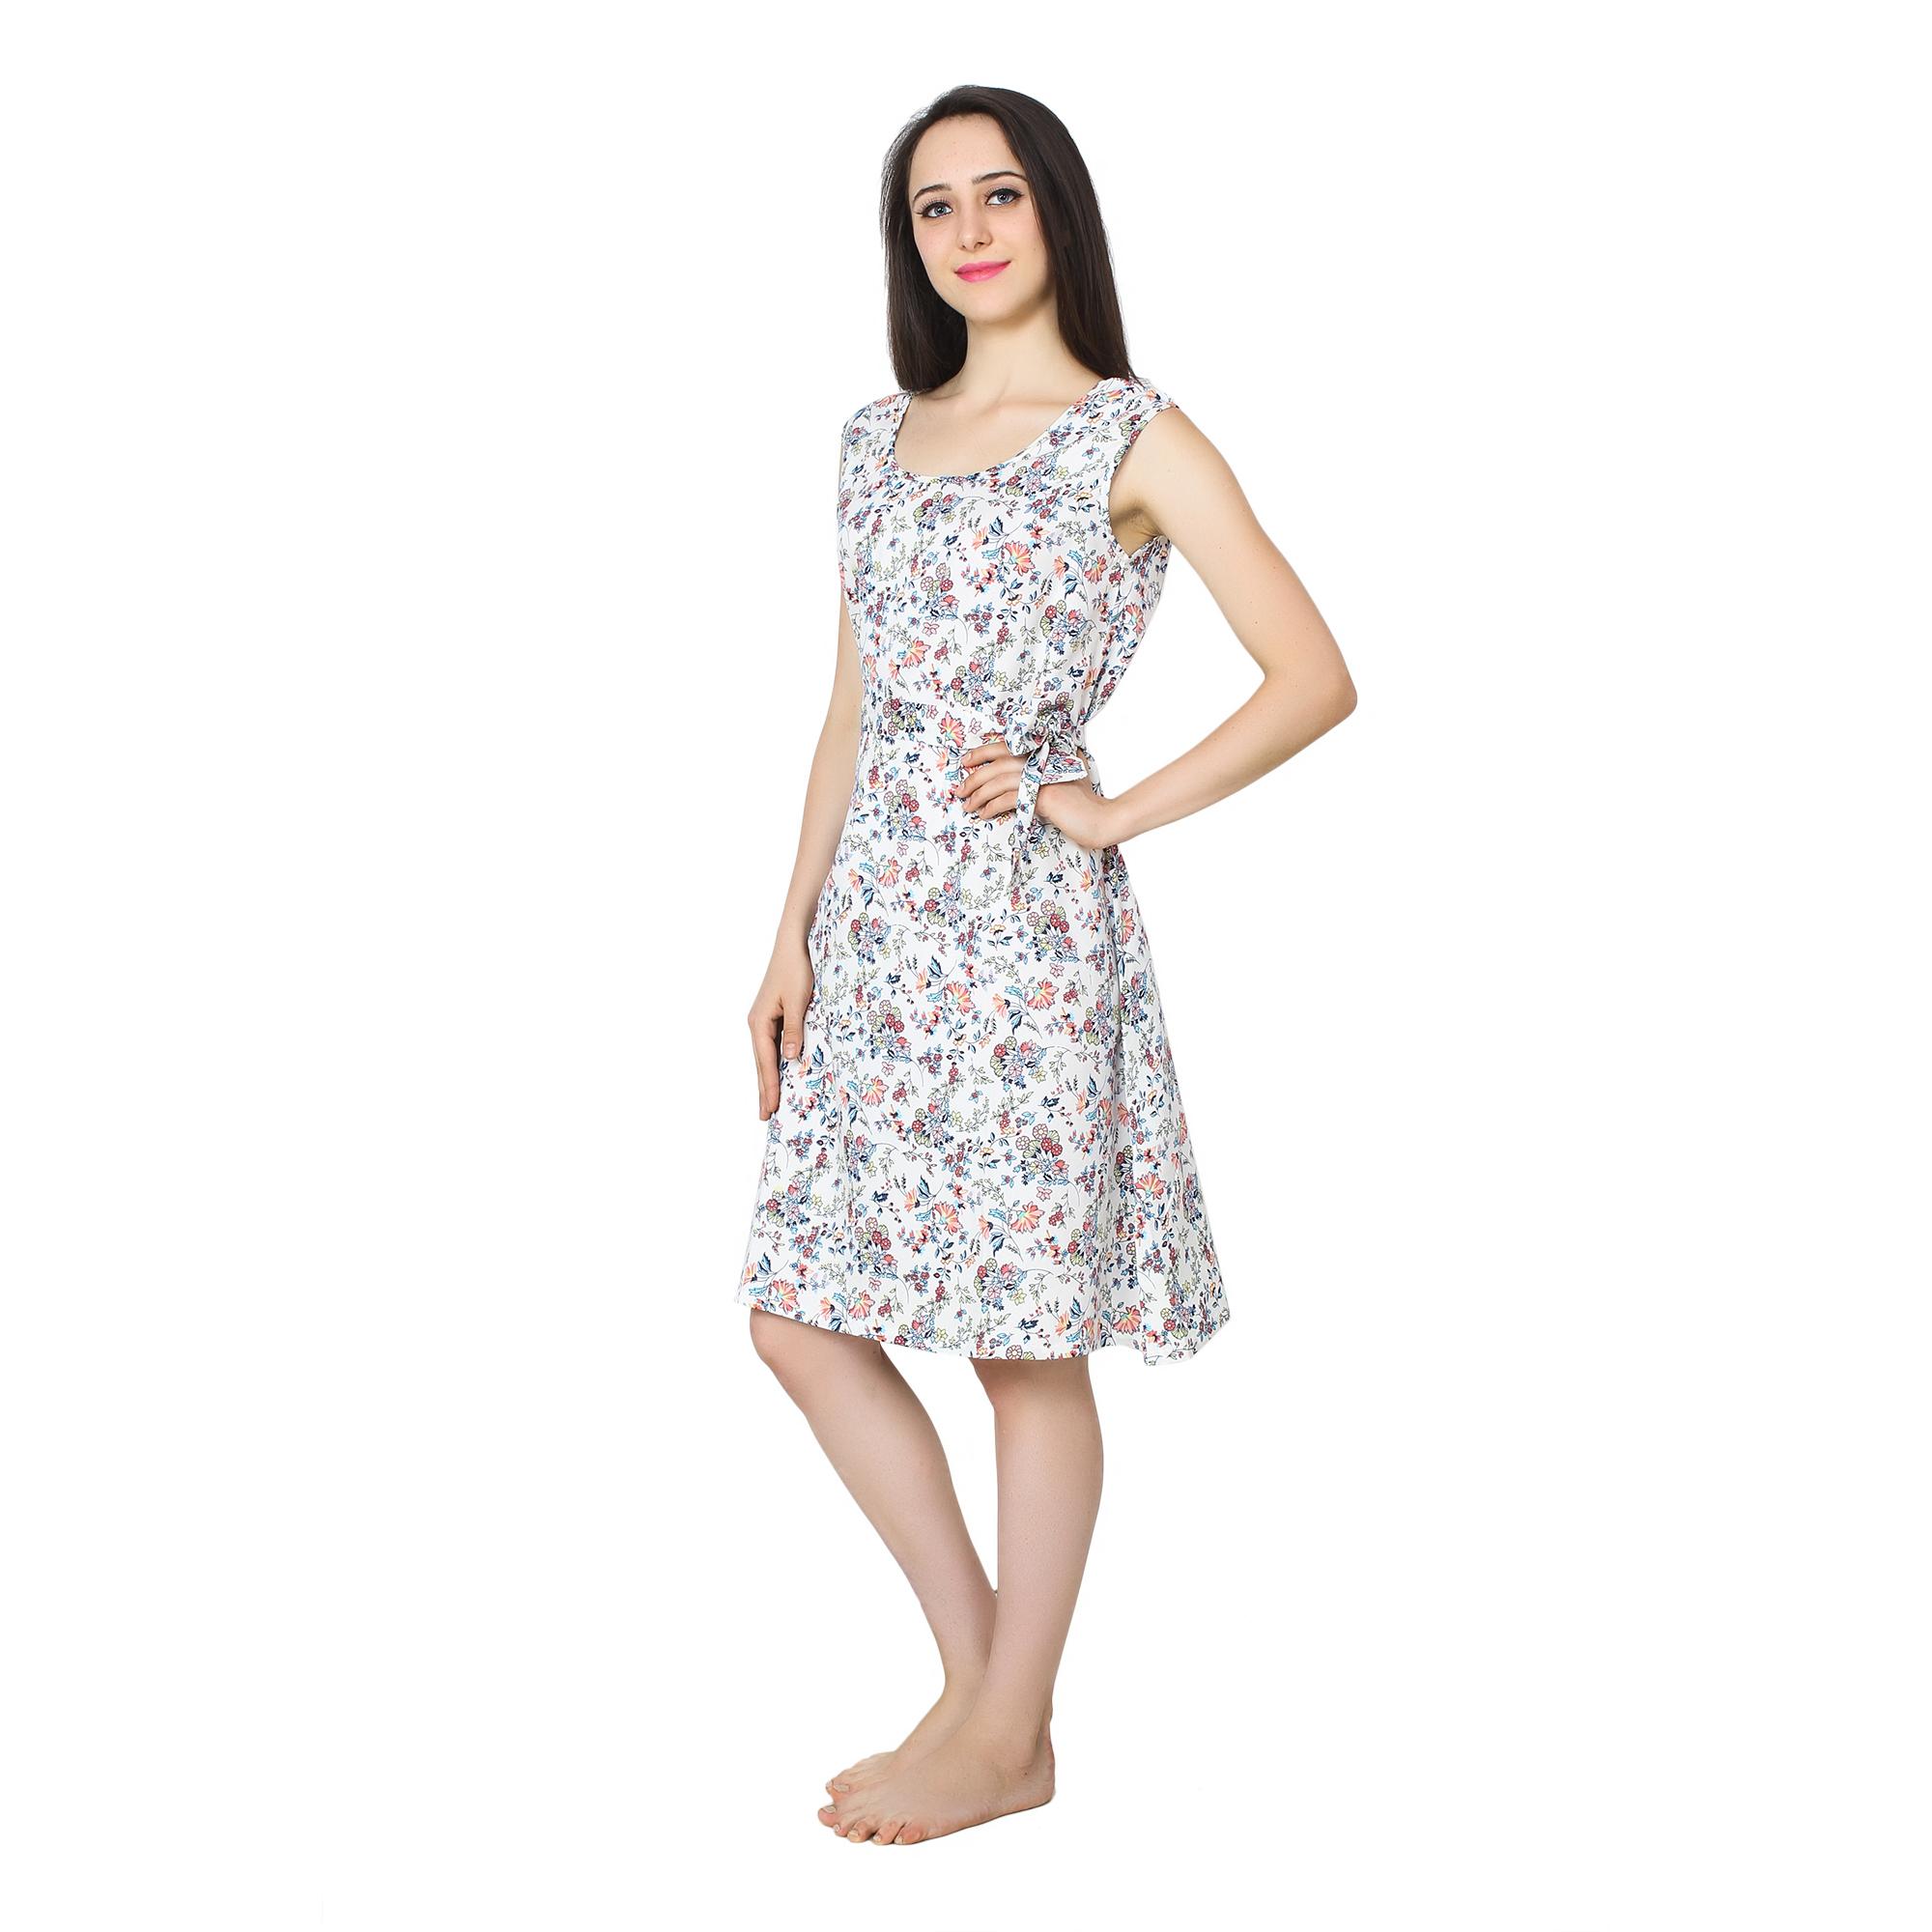 A-Line Floral Print Midi Dress in White Print